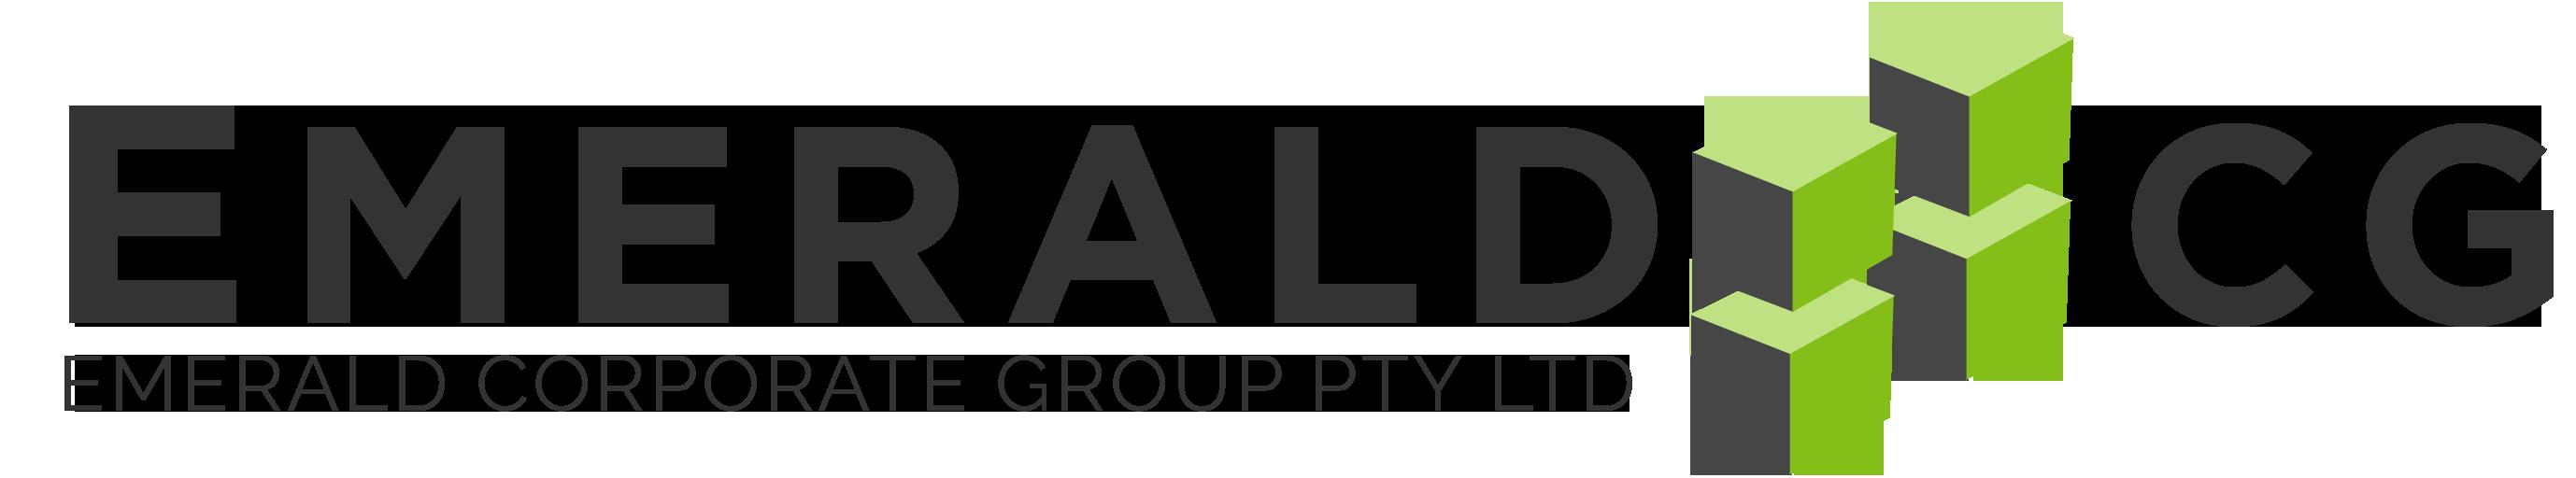 Emerald Corporate Group